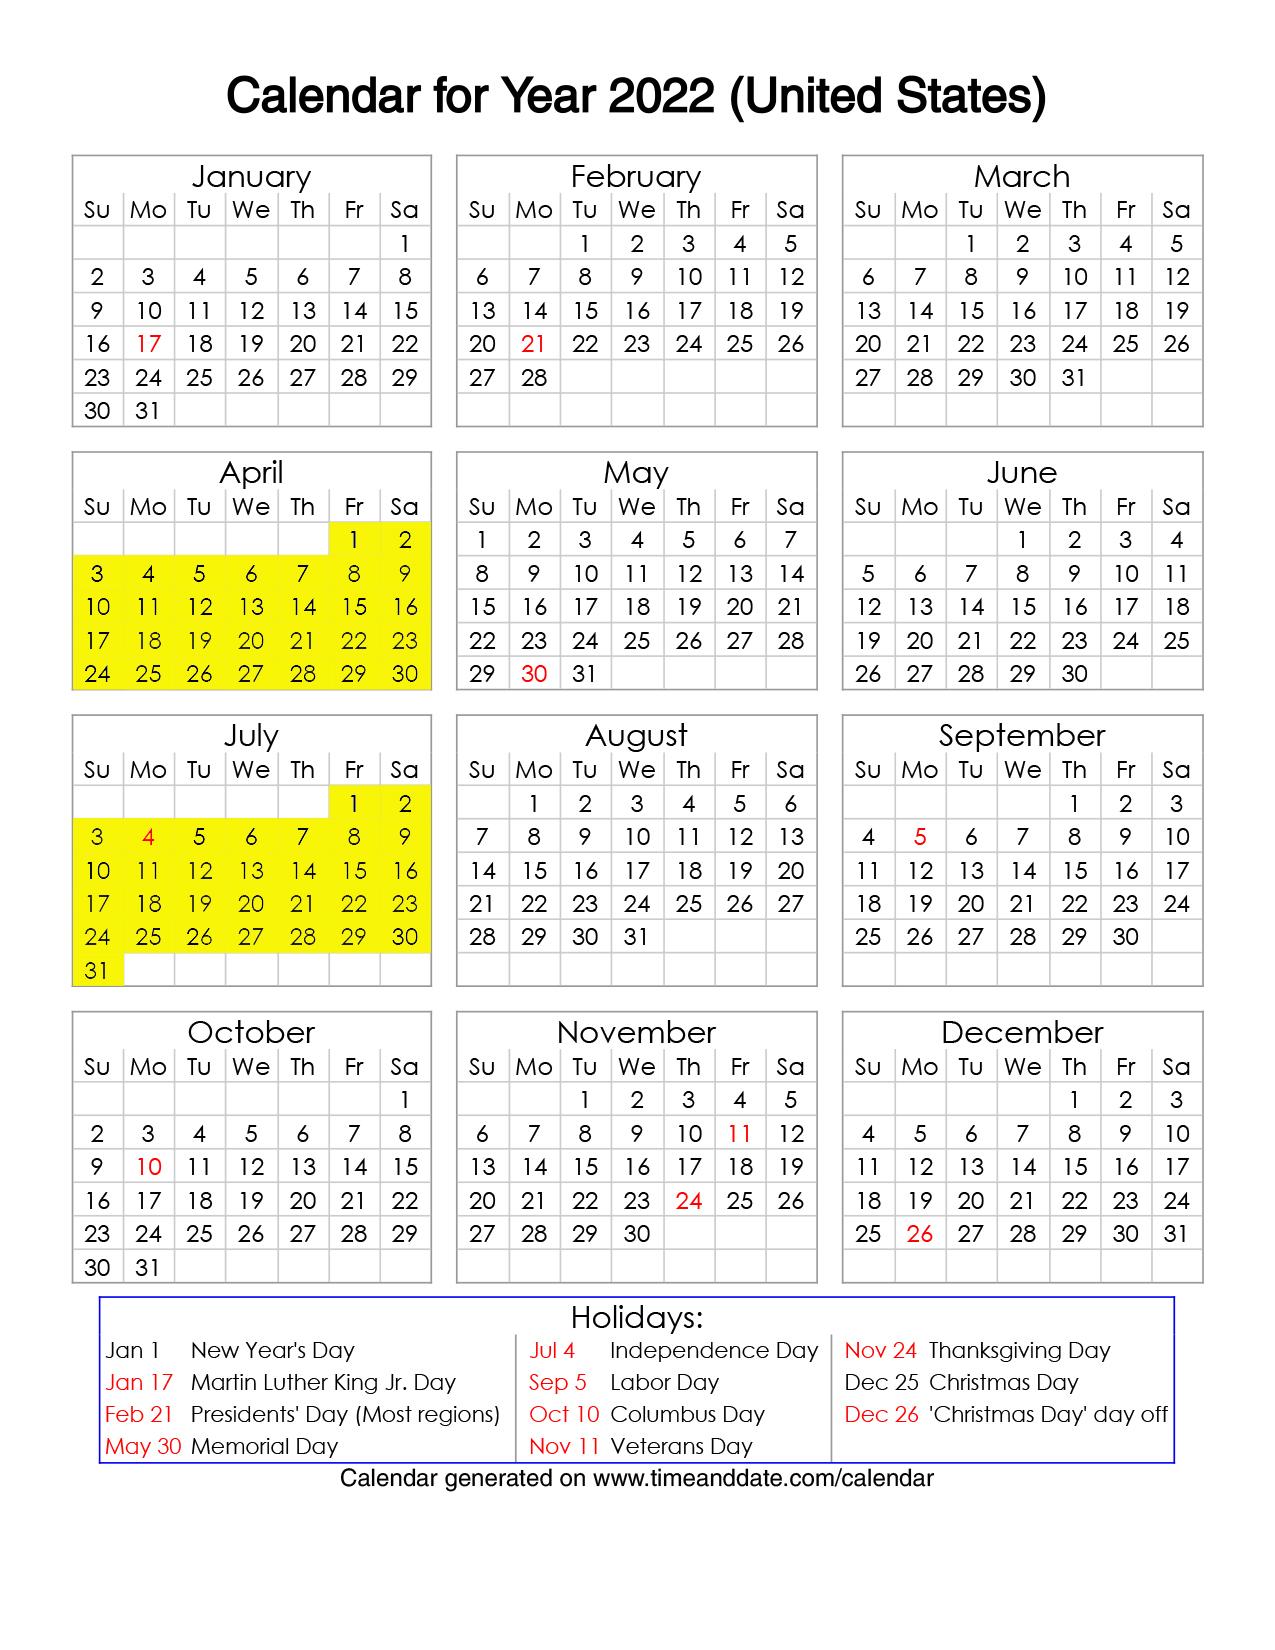 Year 2022 Calendar – United States 02